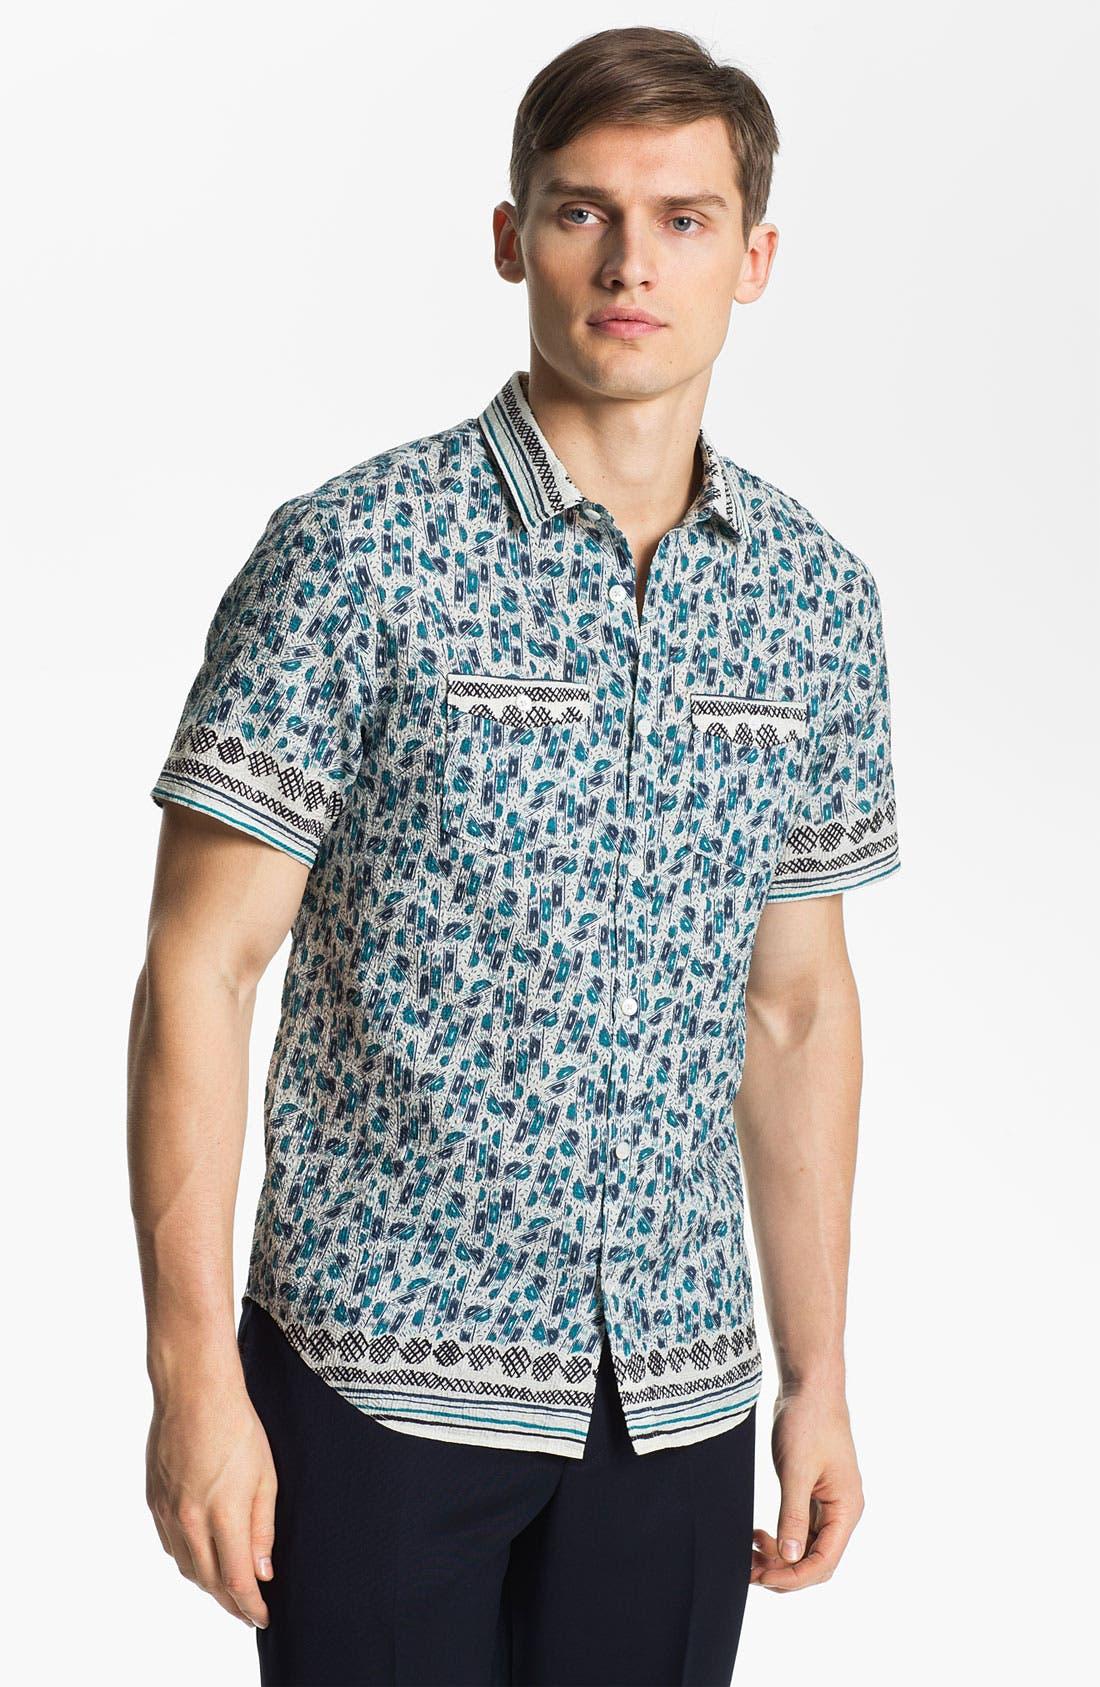 Main Image - Burberry Prorsum Crinkled Print Shirt